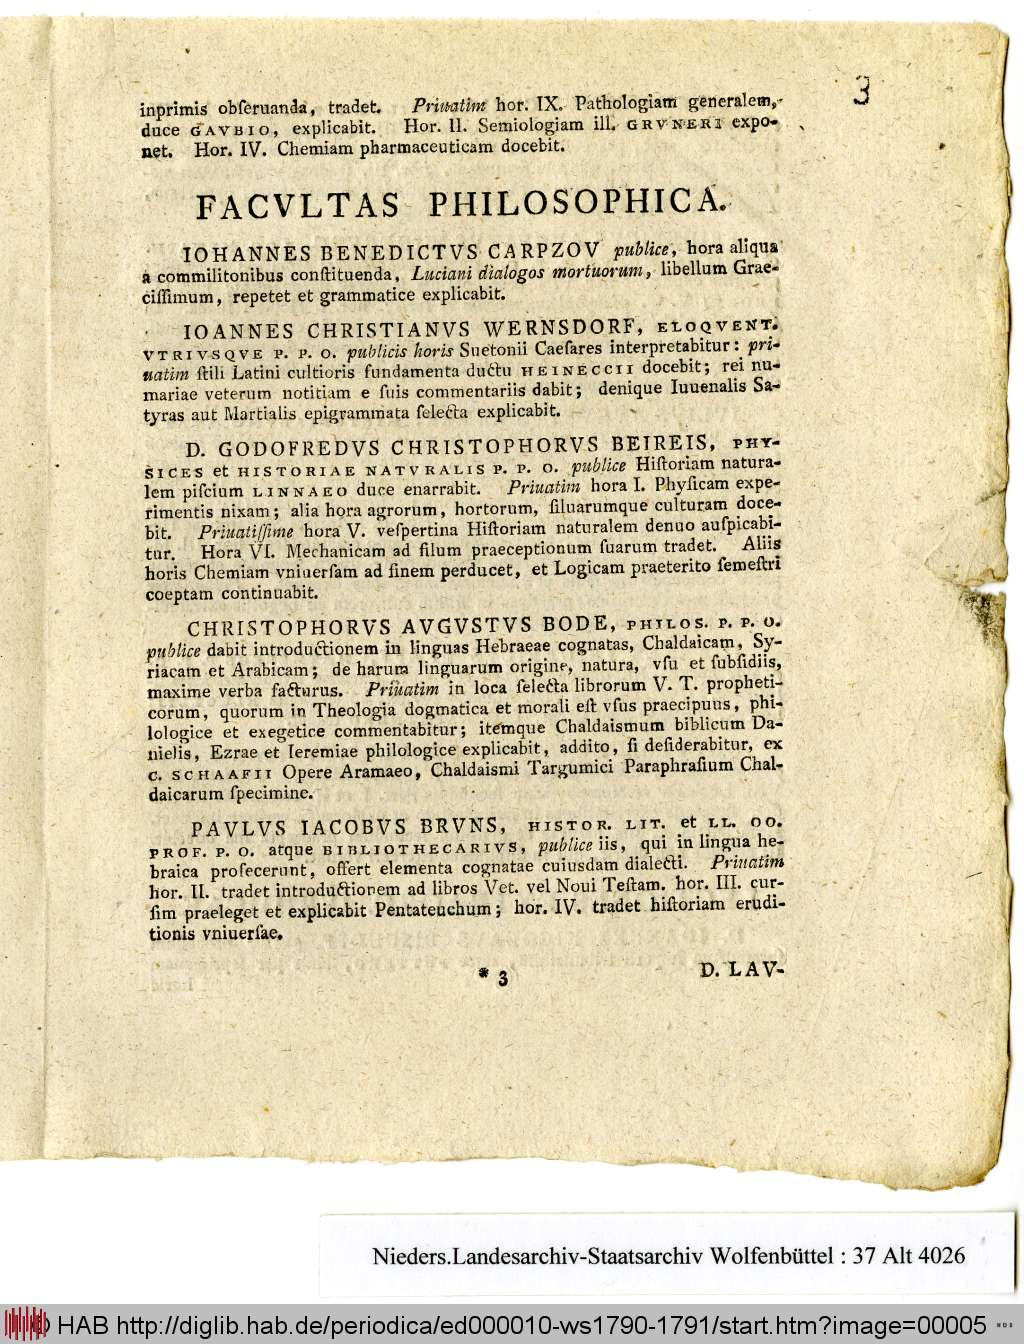 http://diglib.hab.de/periodica/ed000010-ws1790-1791/00005.jpg